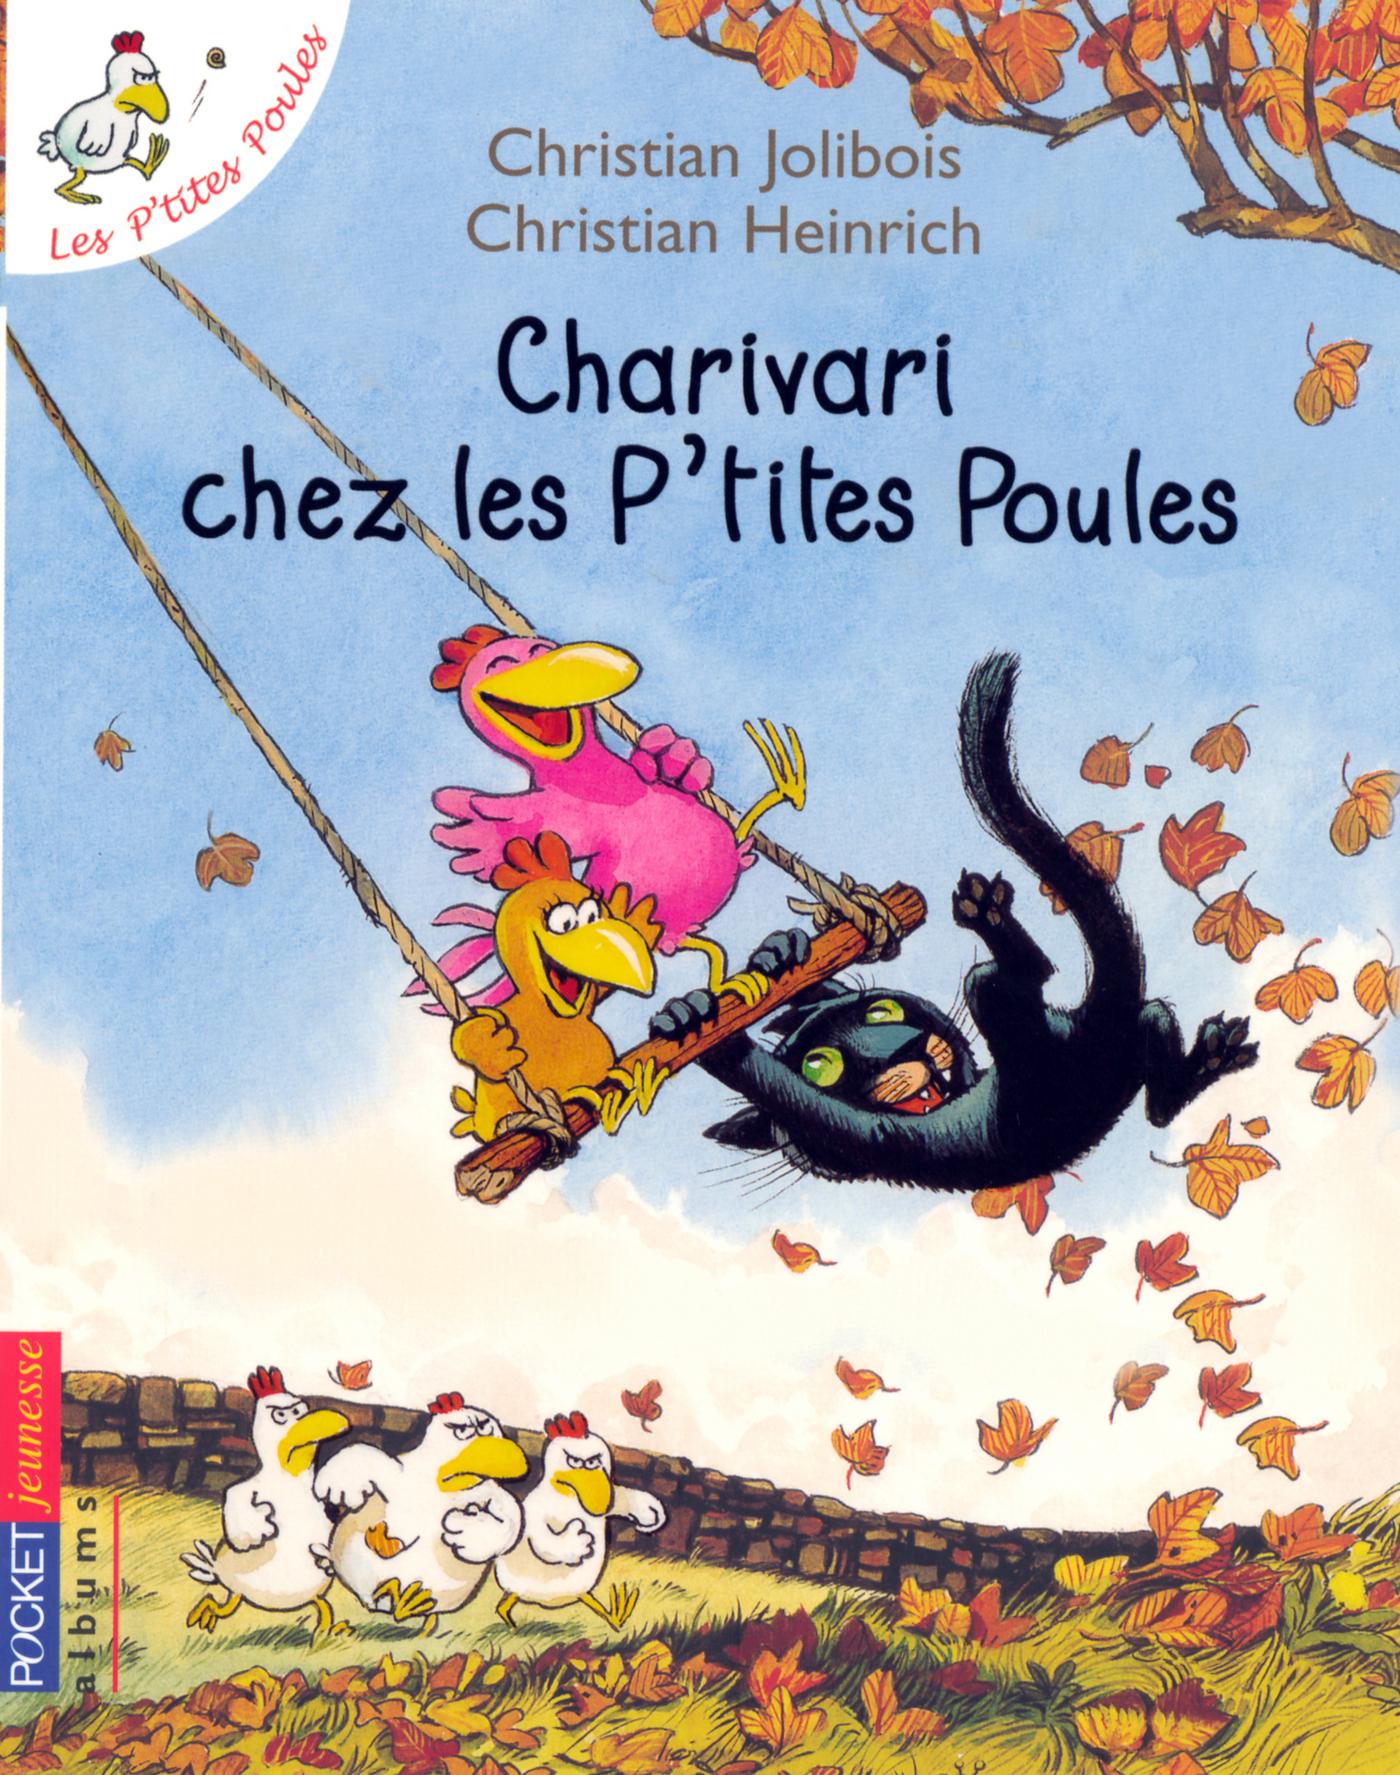 Les P'tites Poules - Charivari chez les P'tites Poules | JOLIBOIS, Christian